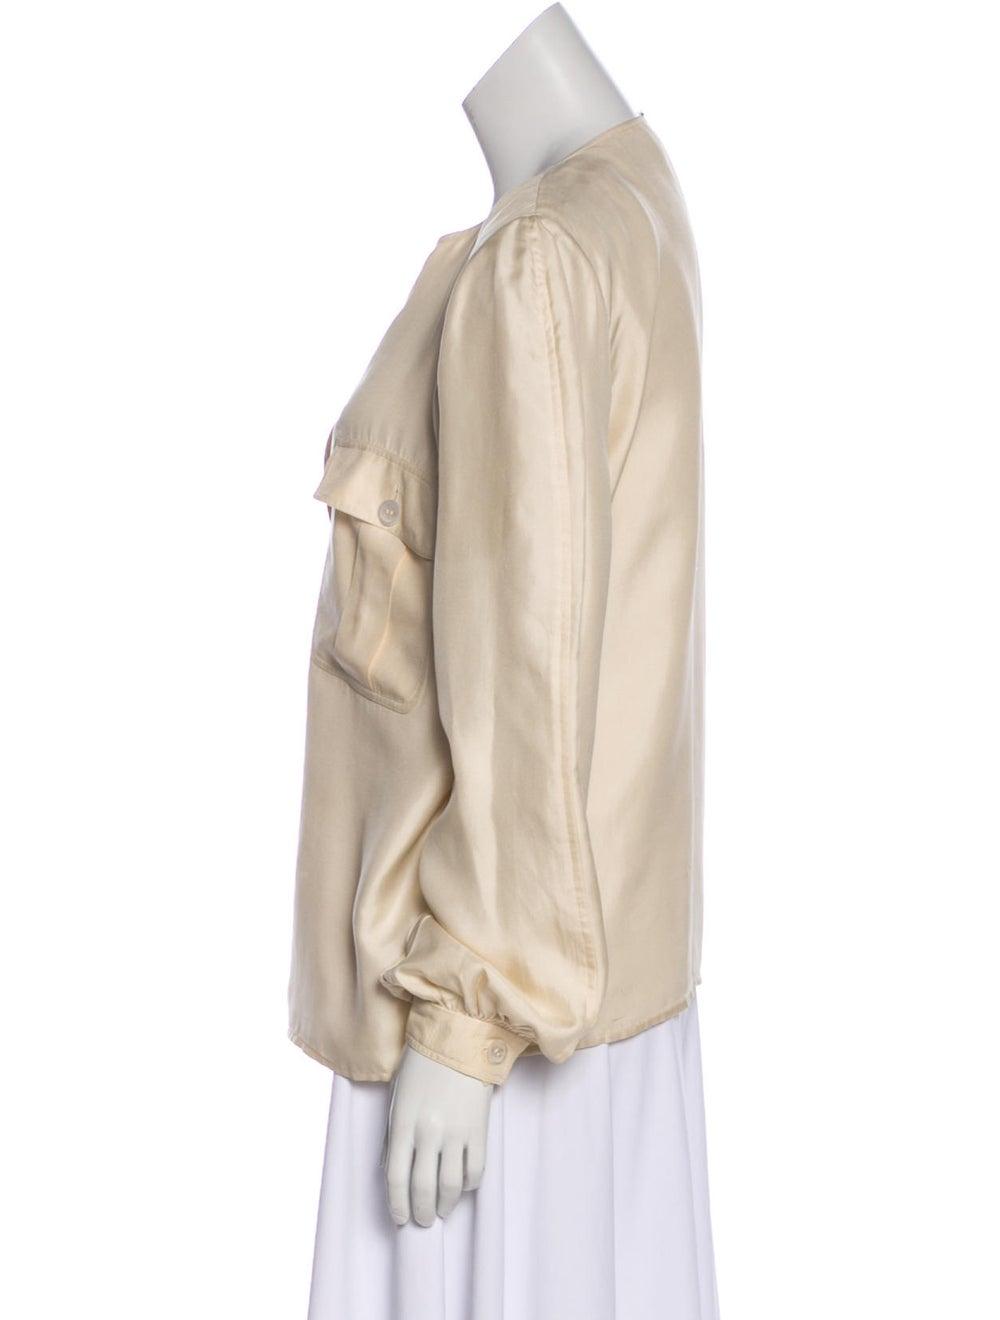 Valentino Silk Long Sleeve Blouse - image 2